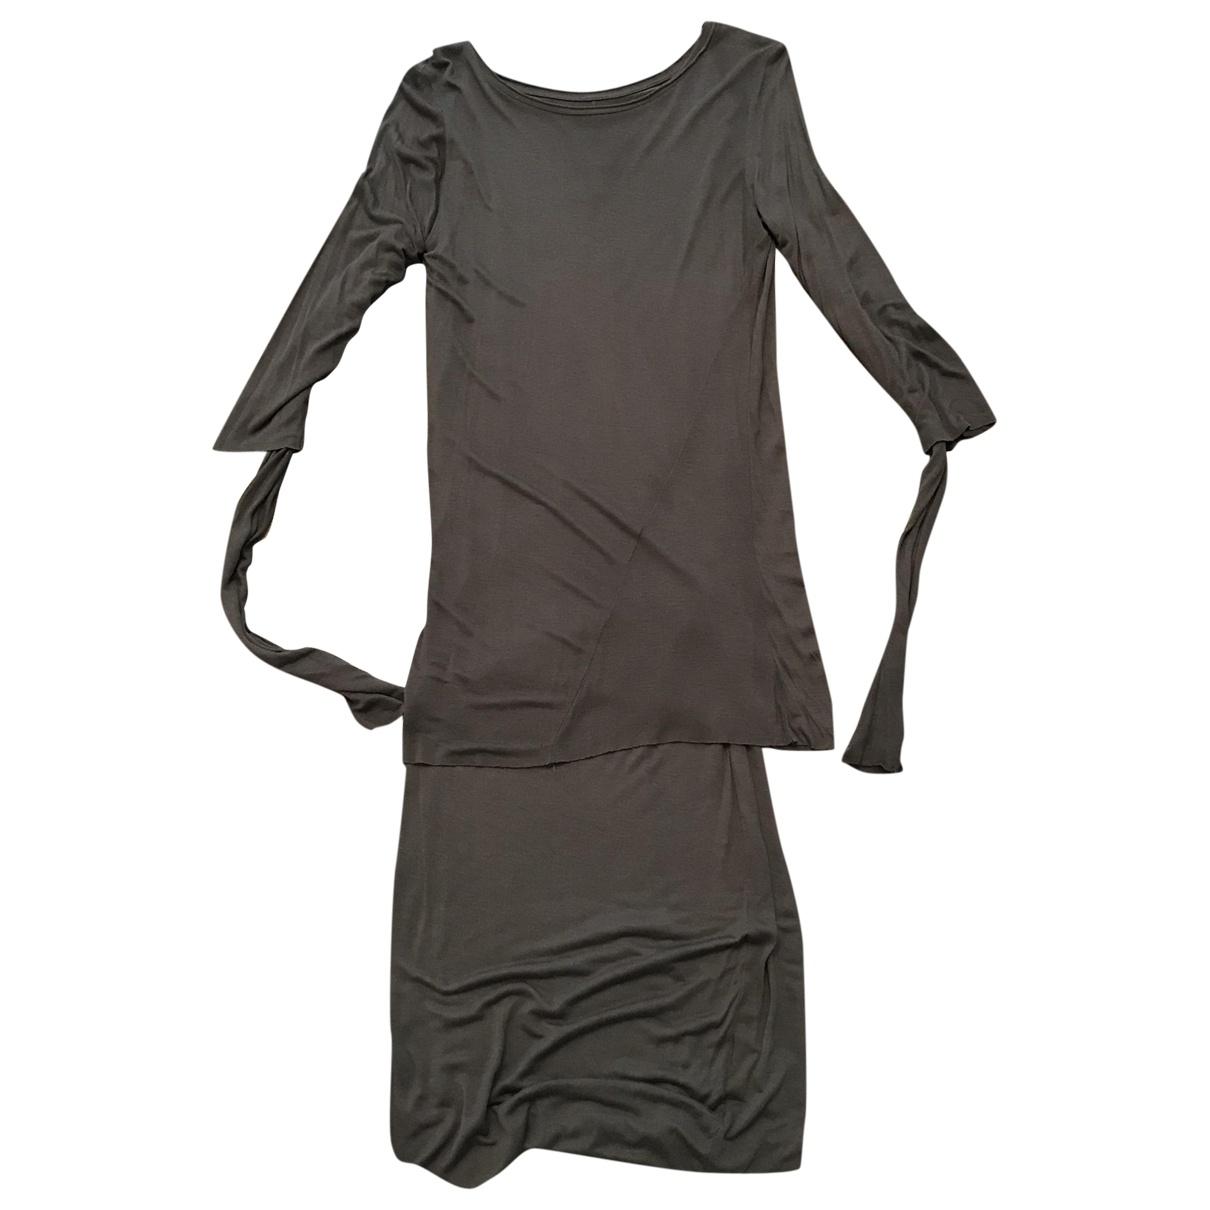 Thom Krom \N Khaki dress for Women XS International